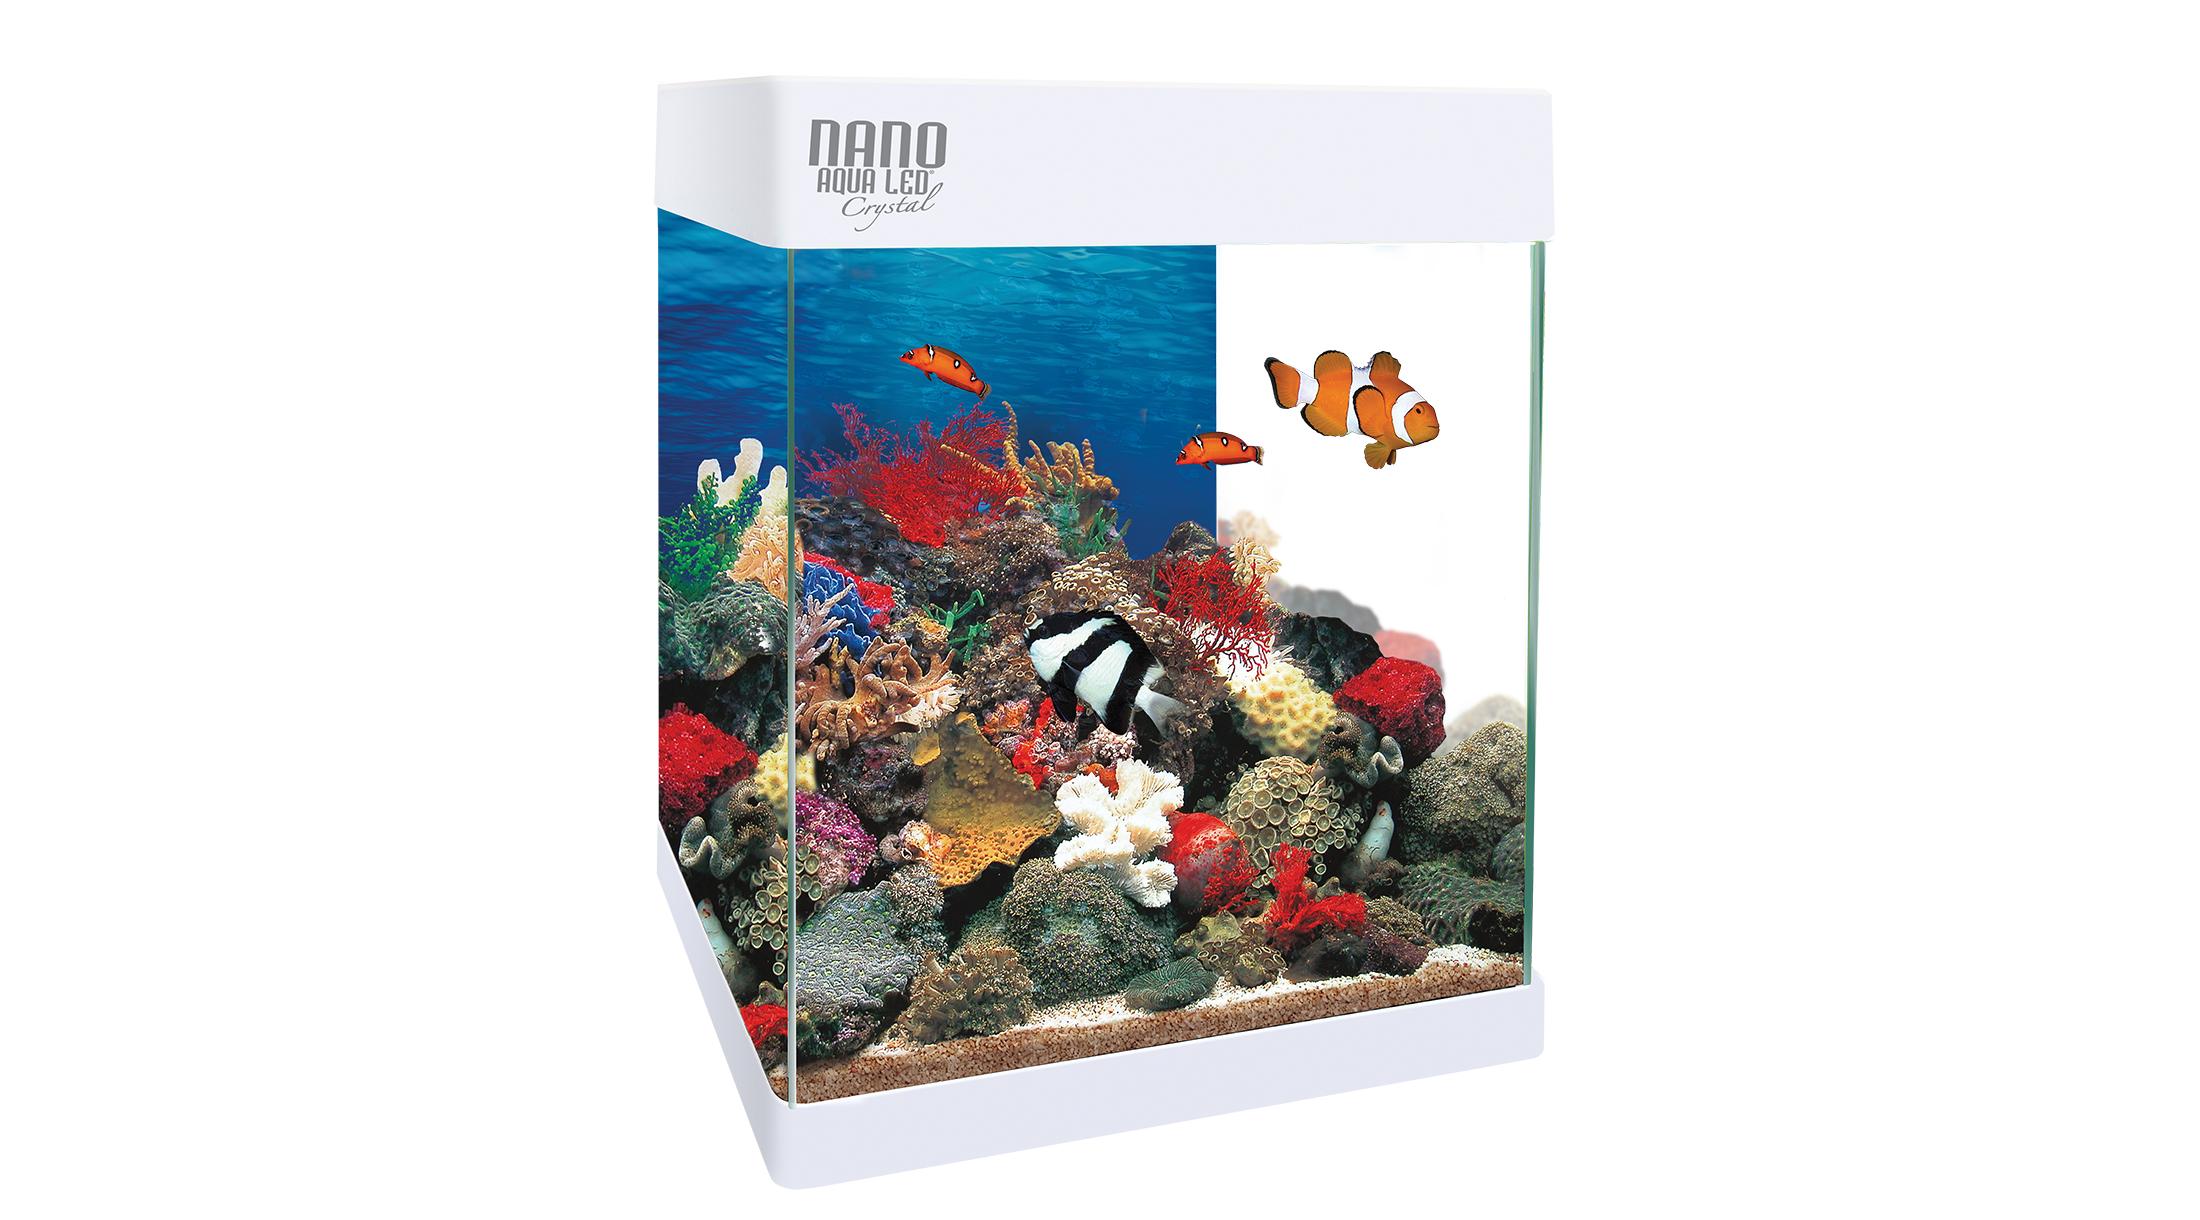 Acuario Nano Reef